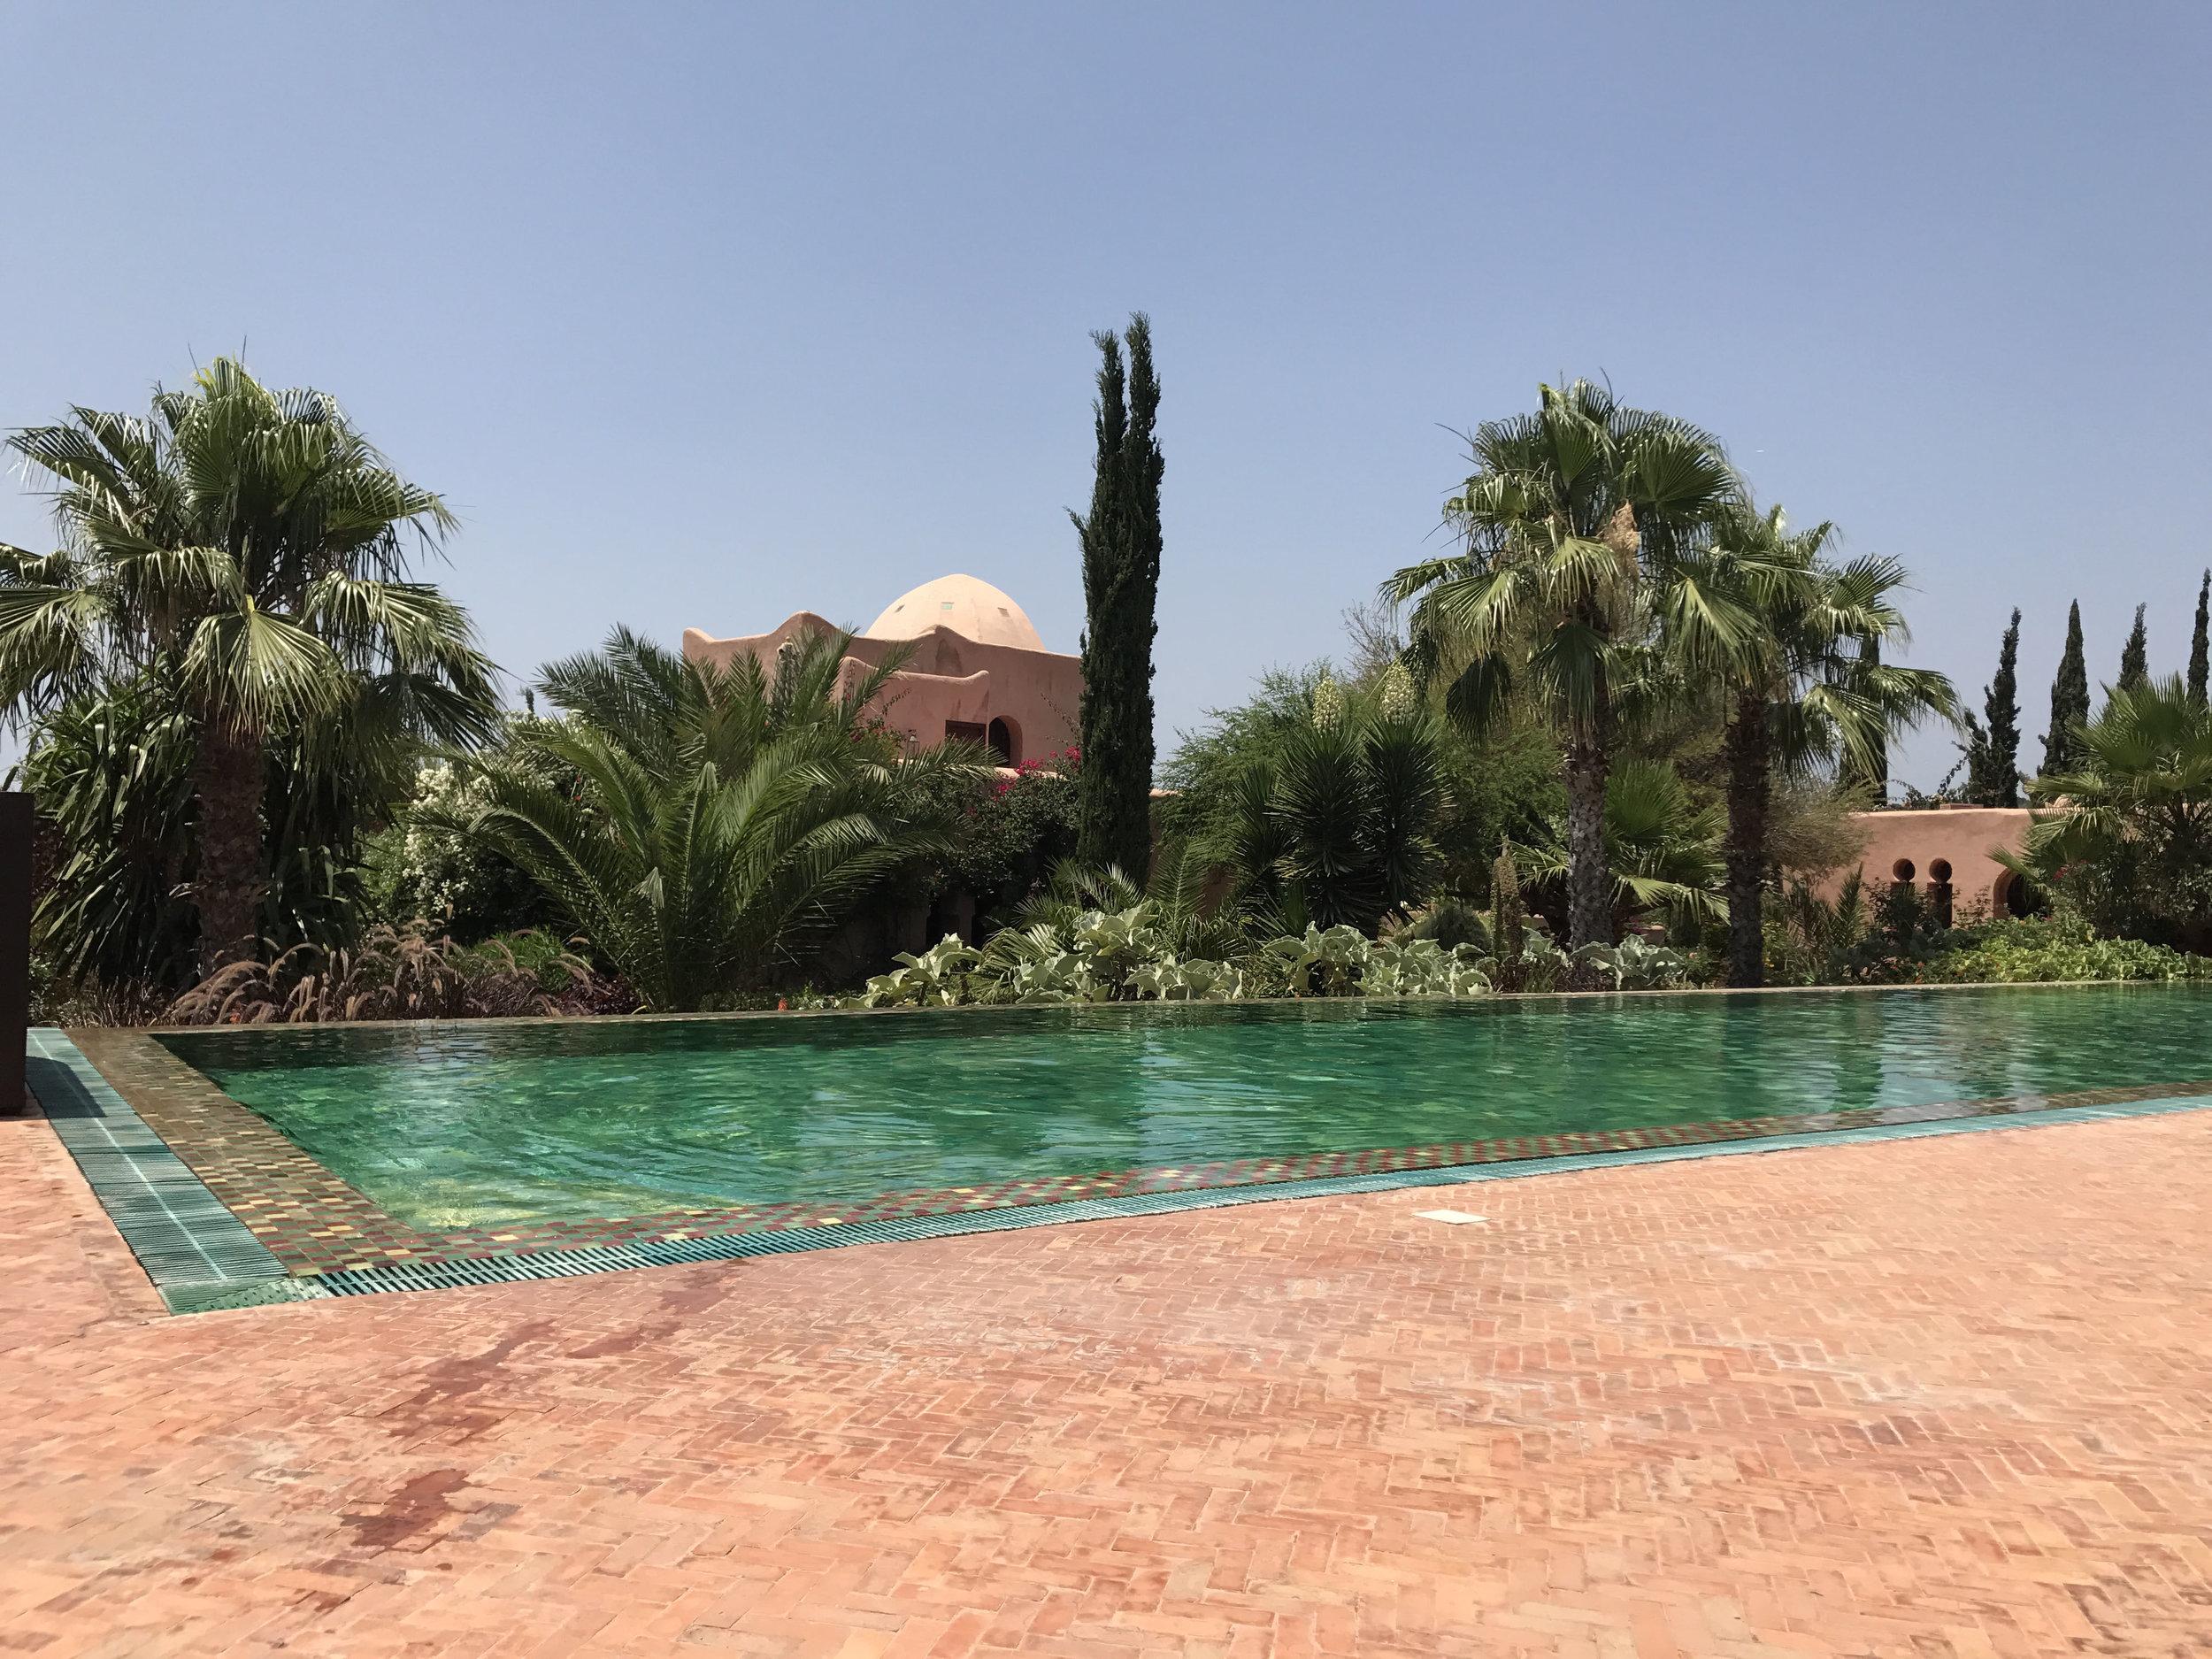 MoroccoPool.jpg